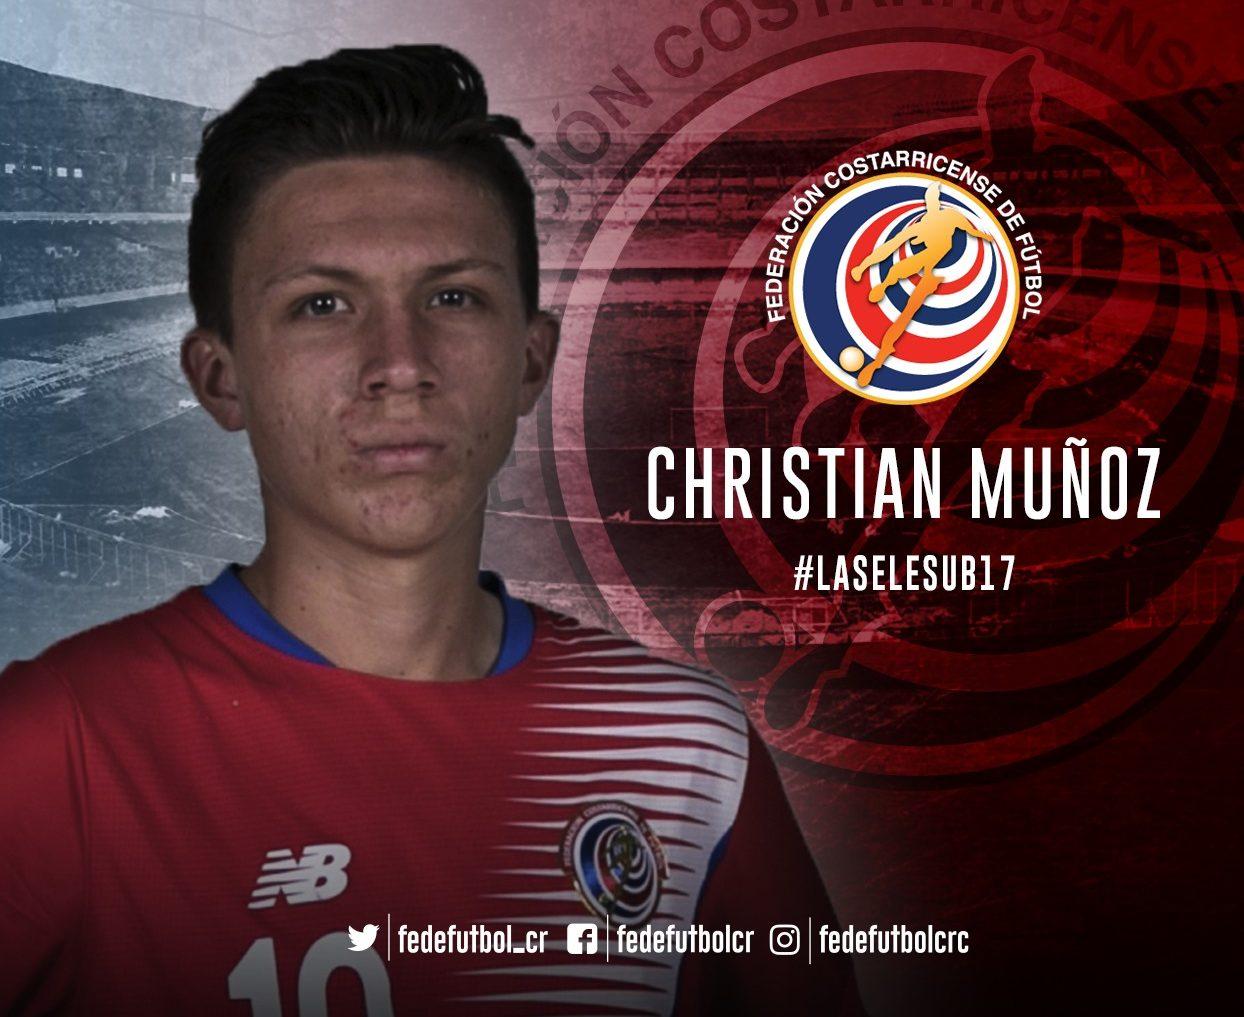 ¿Quién es Christian Muñoz?